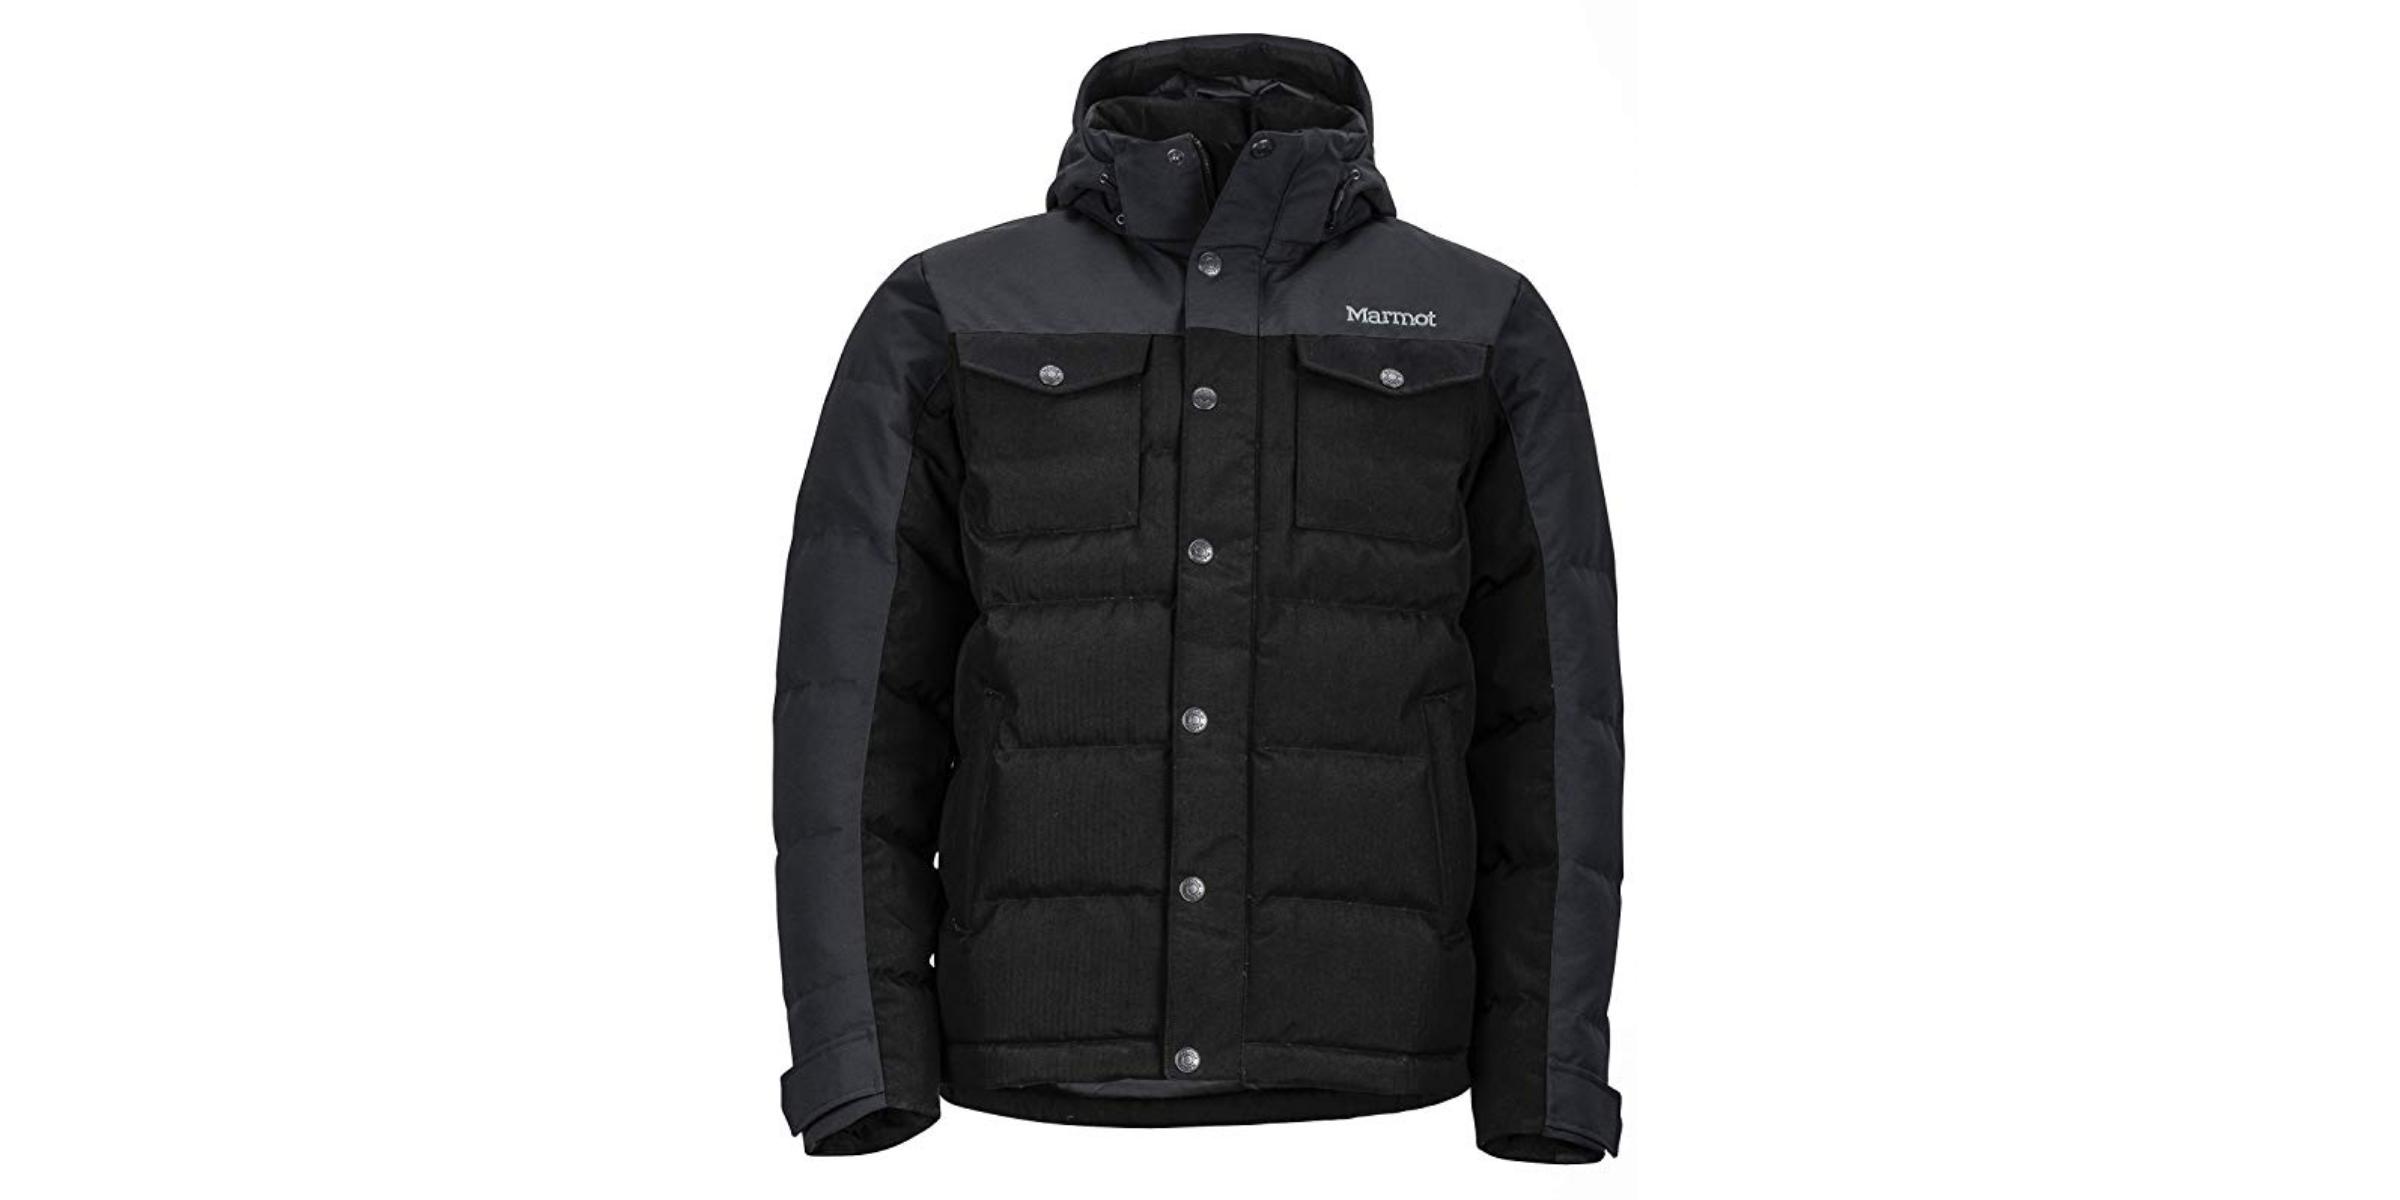 eb855203b9 Best Winter Coats 2018 | Warmest Winter Coats